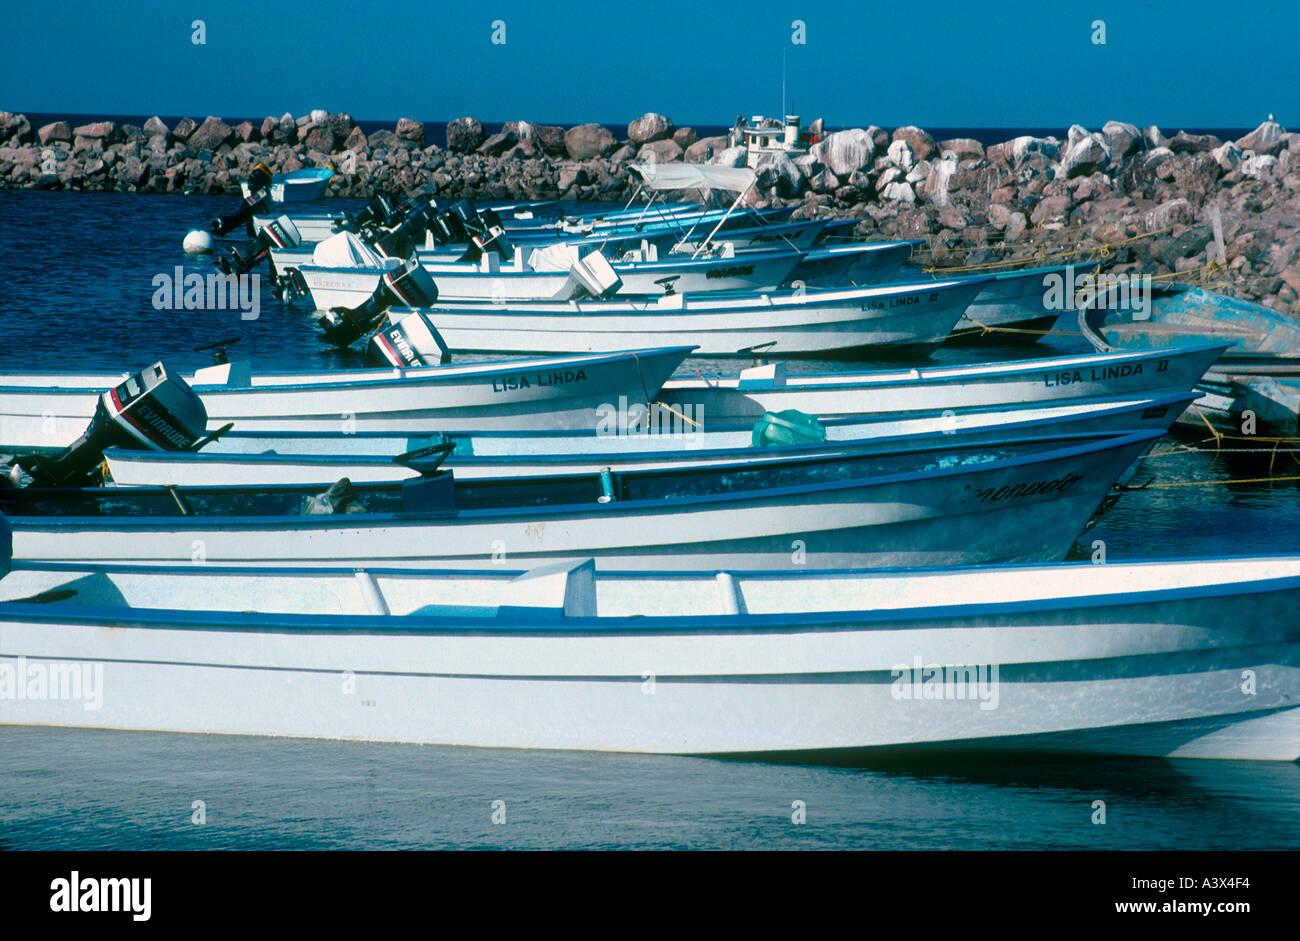 Fishing boats loreto baja california sur mexico stock for Baja california fishing